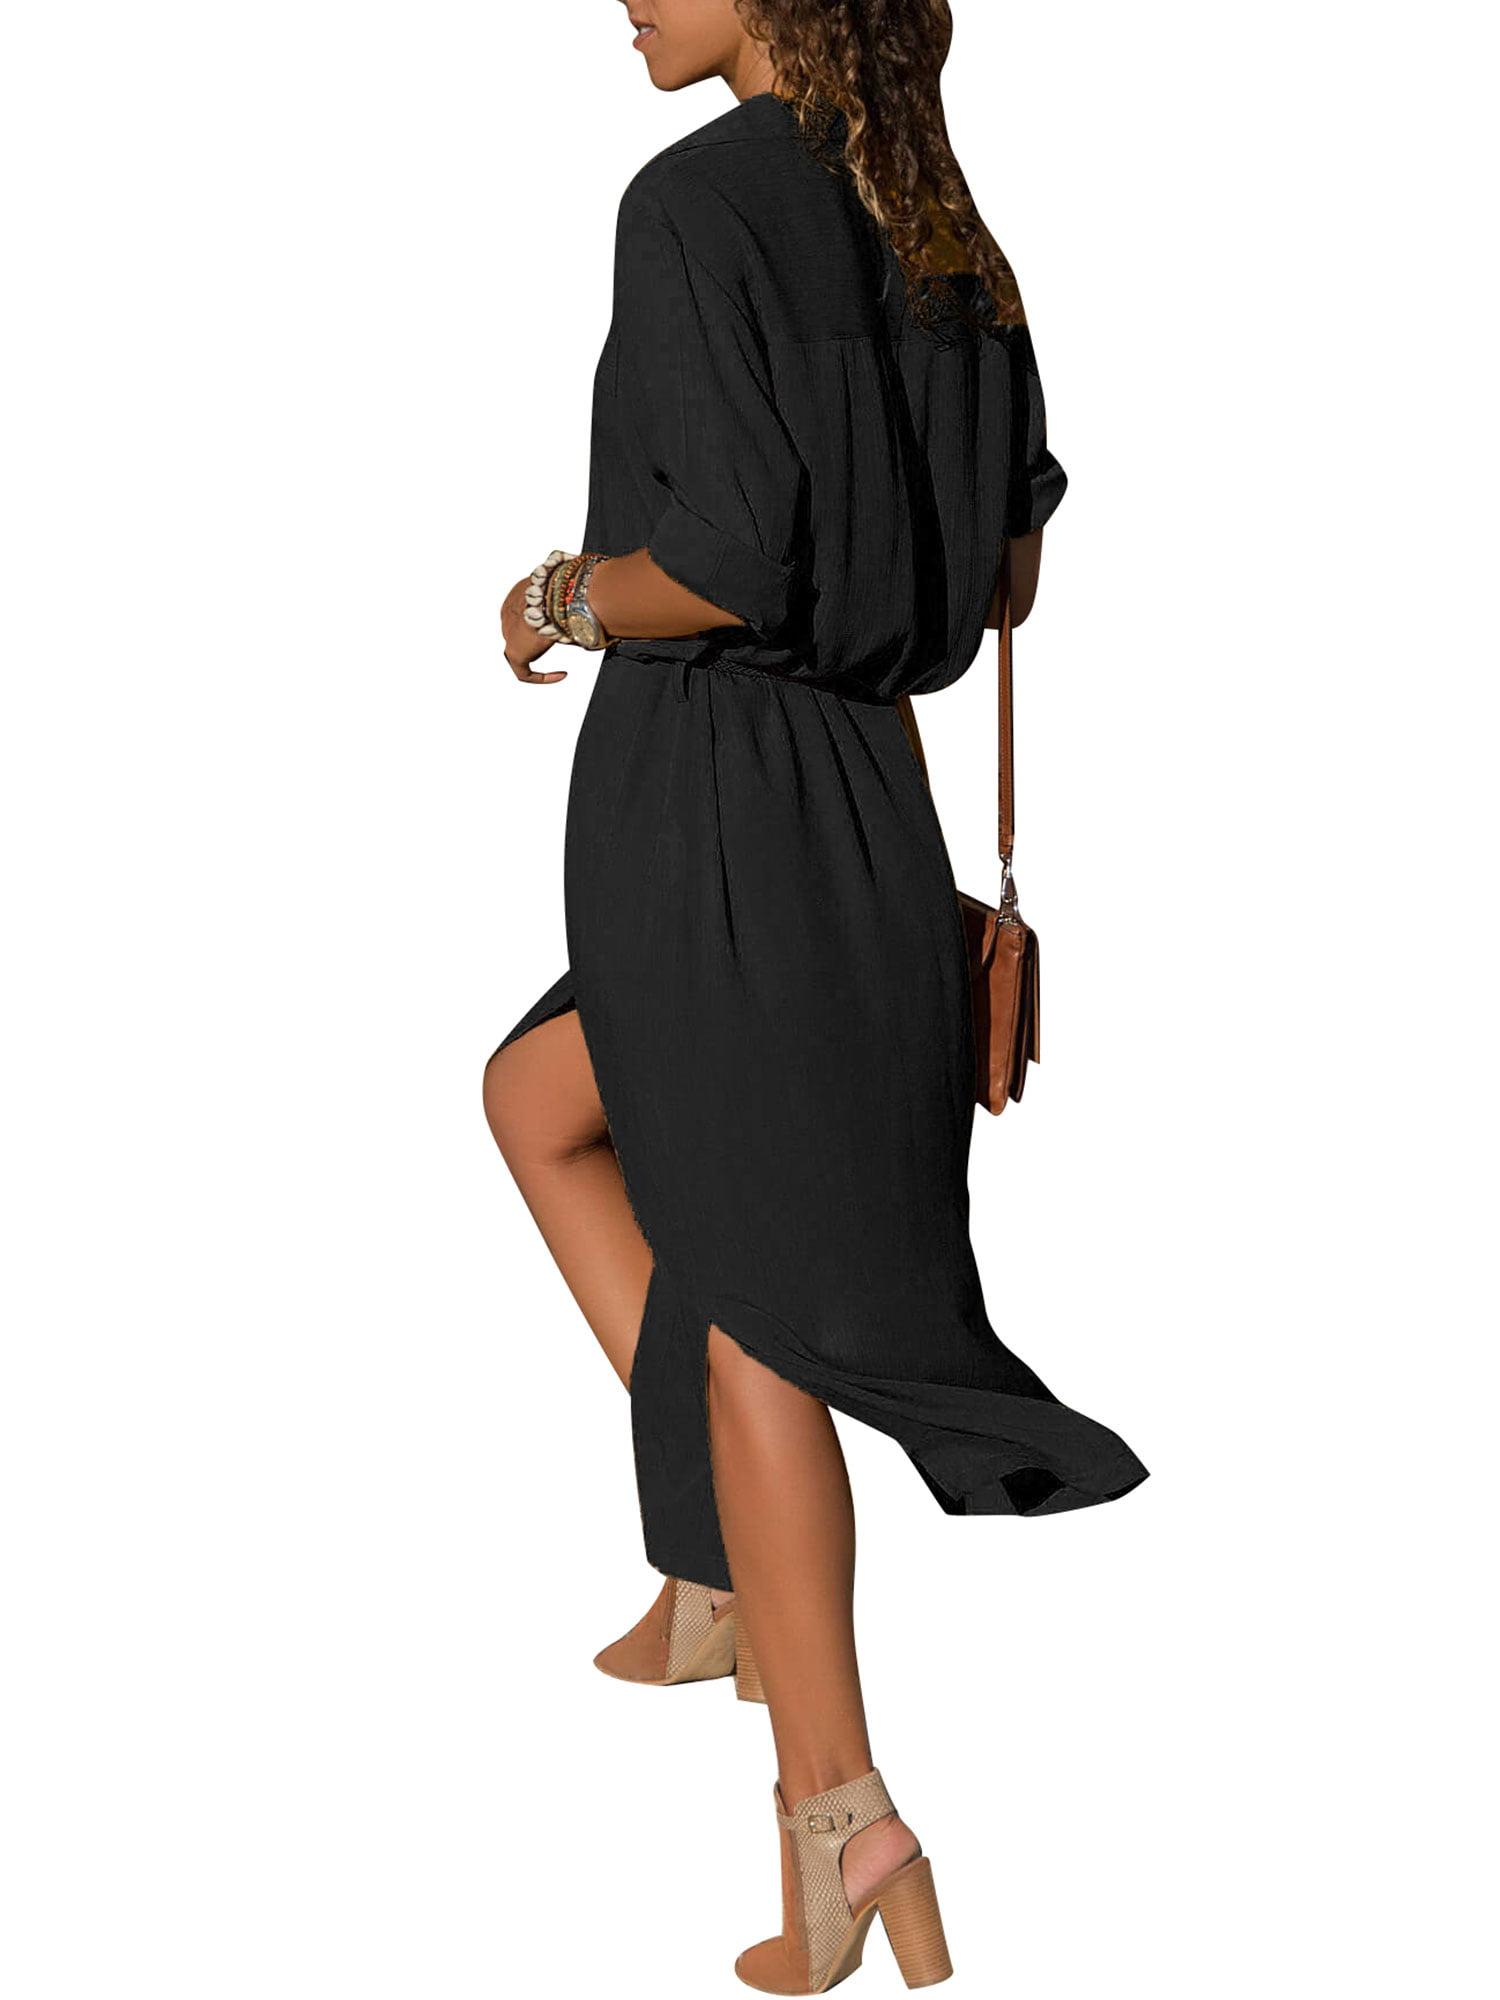 a3a240e56c8 Sexy Dance - Lapel V Neck Button Shirt Dresses for Women Maxi Long Sleeve  Casual Solid Color Loose Boho Tea Dress Side Split Sun Dress - Walmart.com